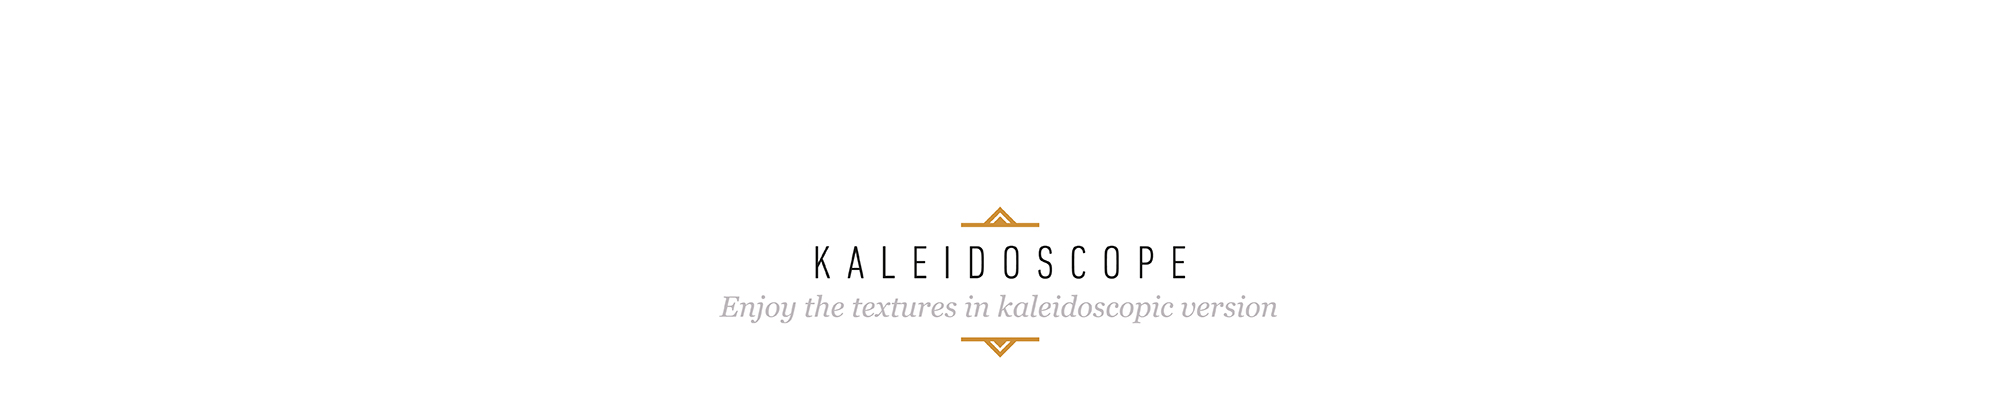 ISTANBUL_Kaleidoscope-Title